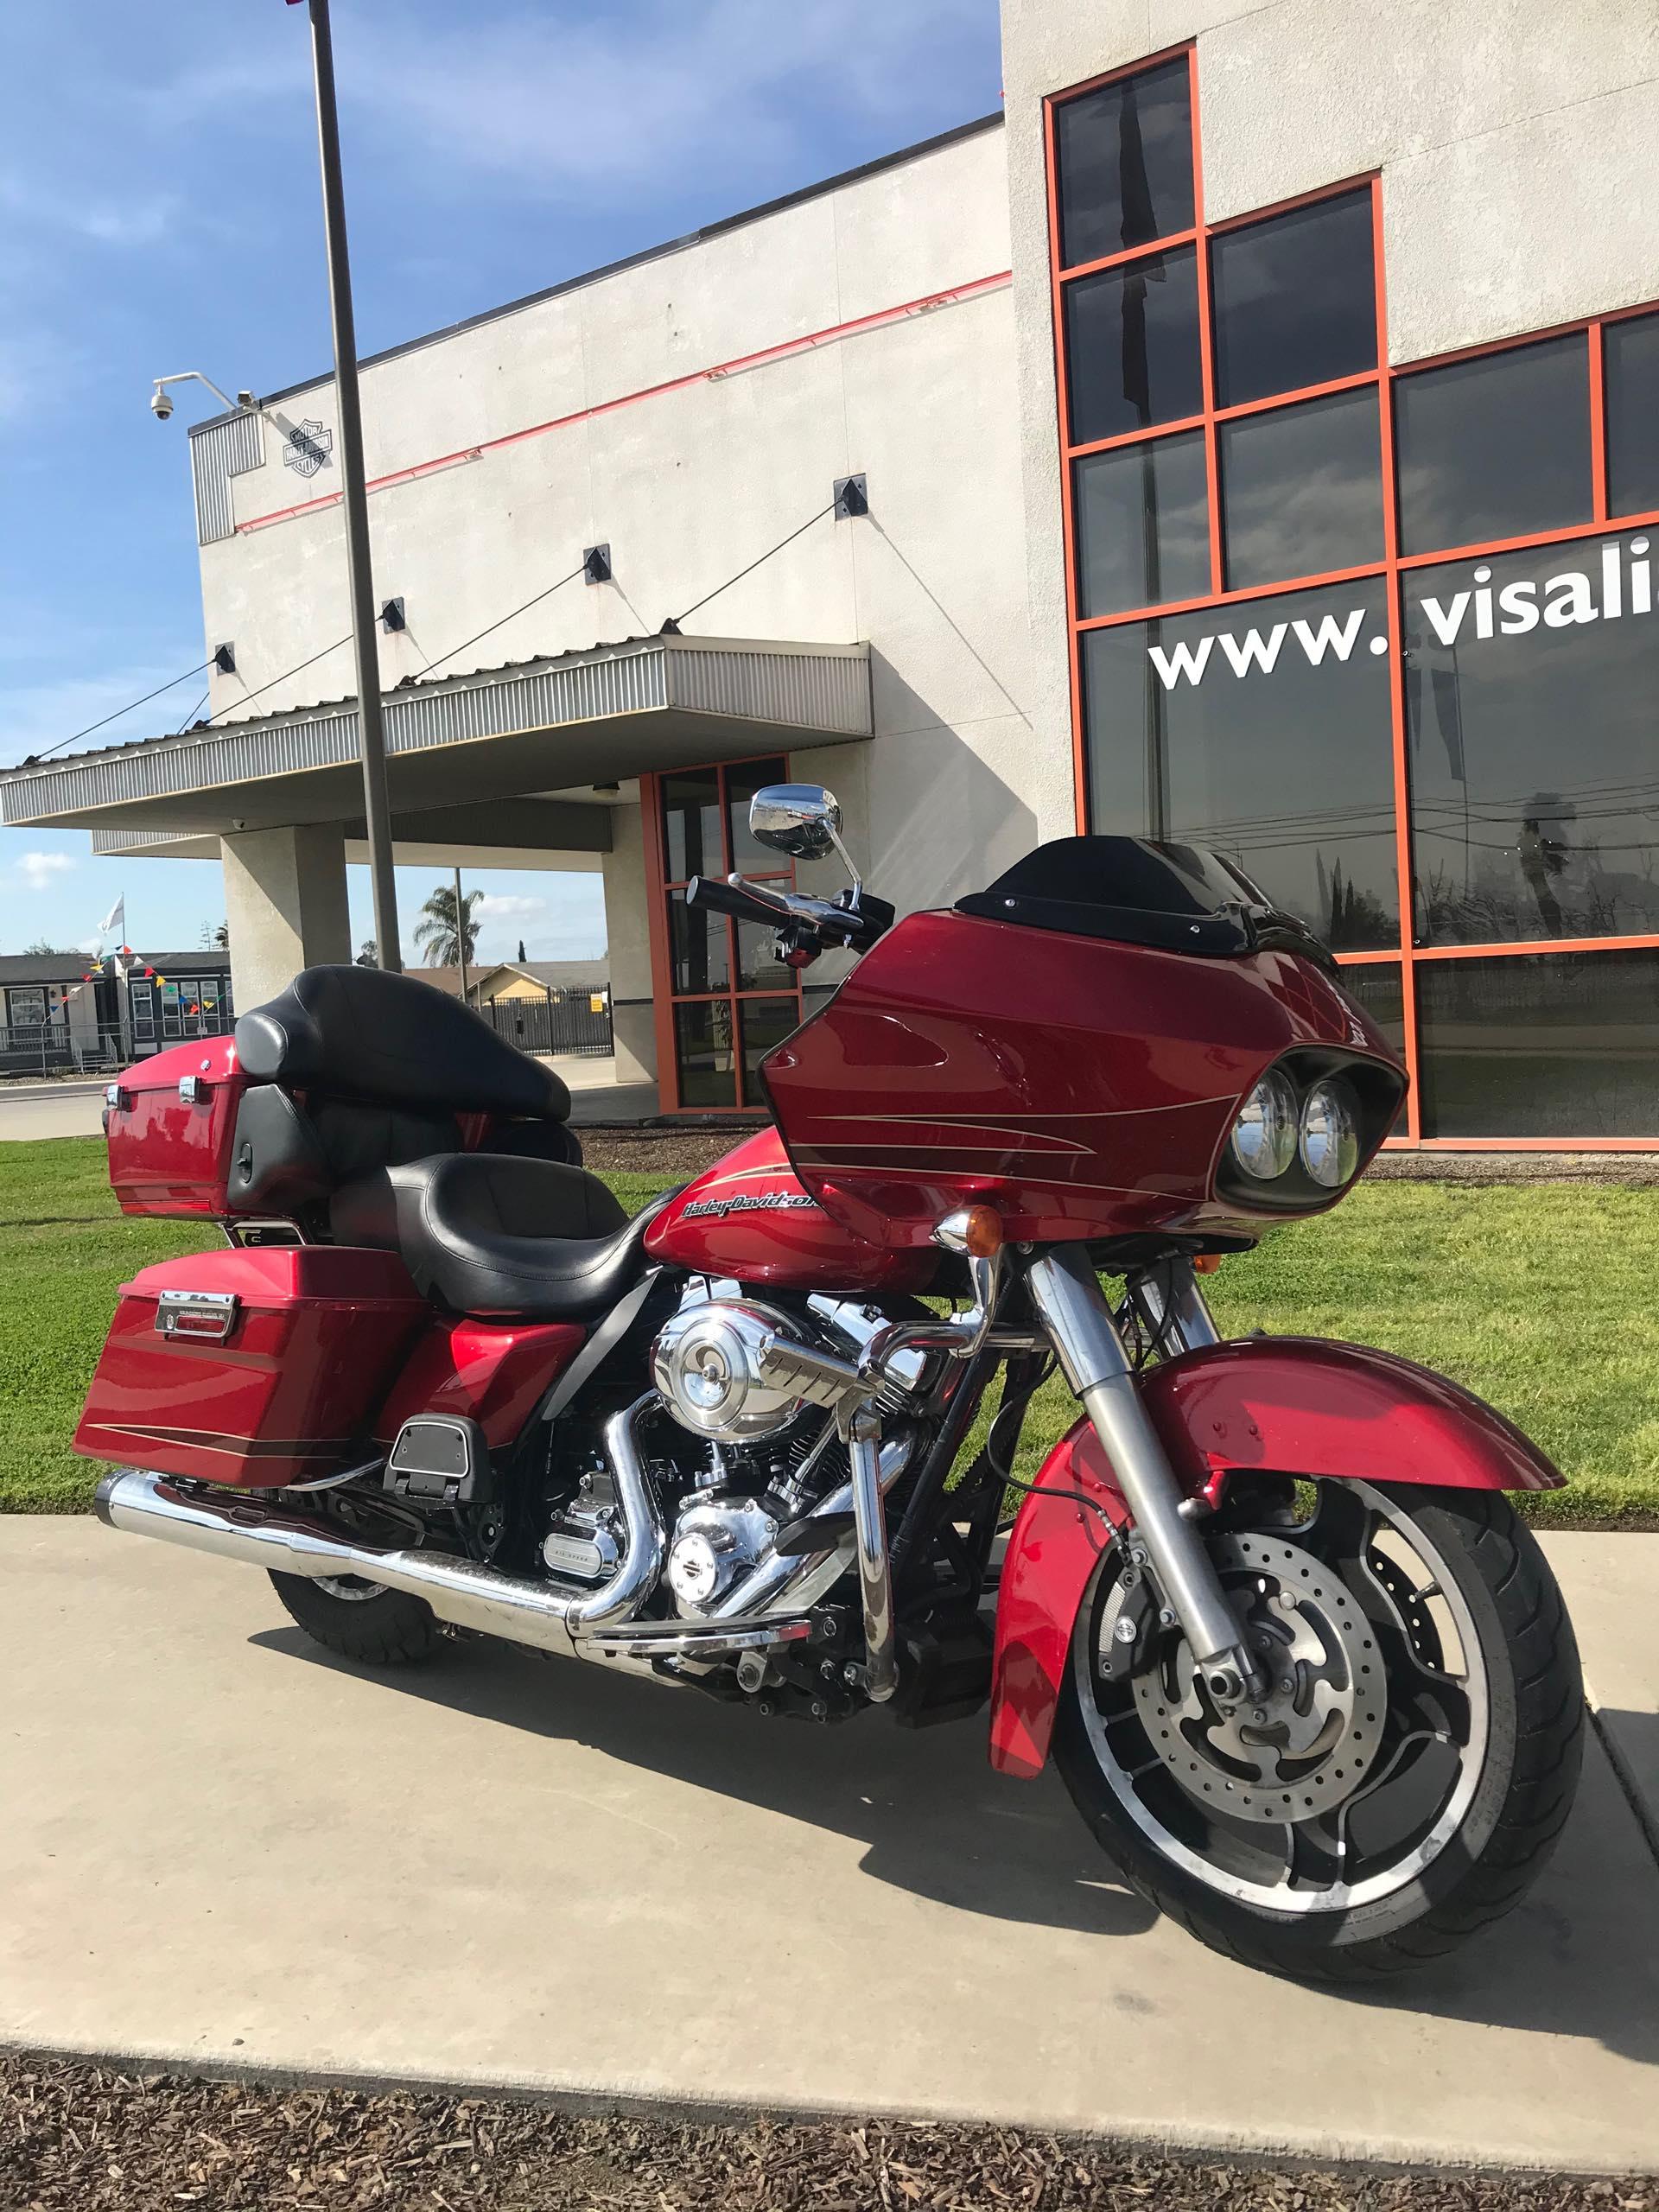 2013 Harley-Davidson Road Glide Ultra at Visalia Harley-Davidson